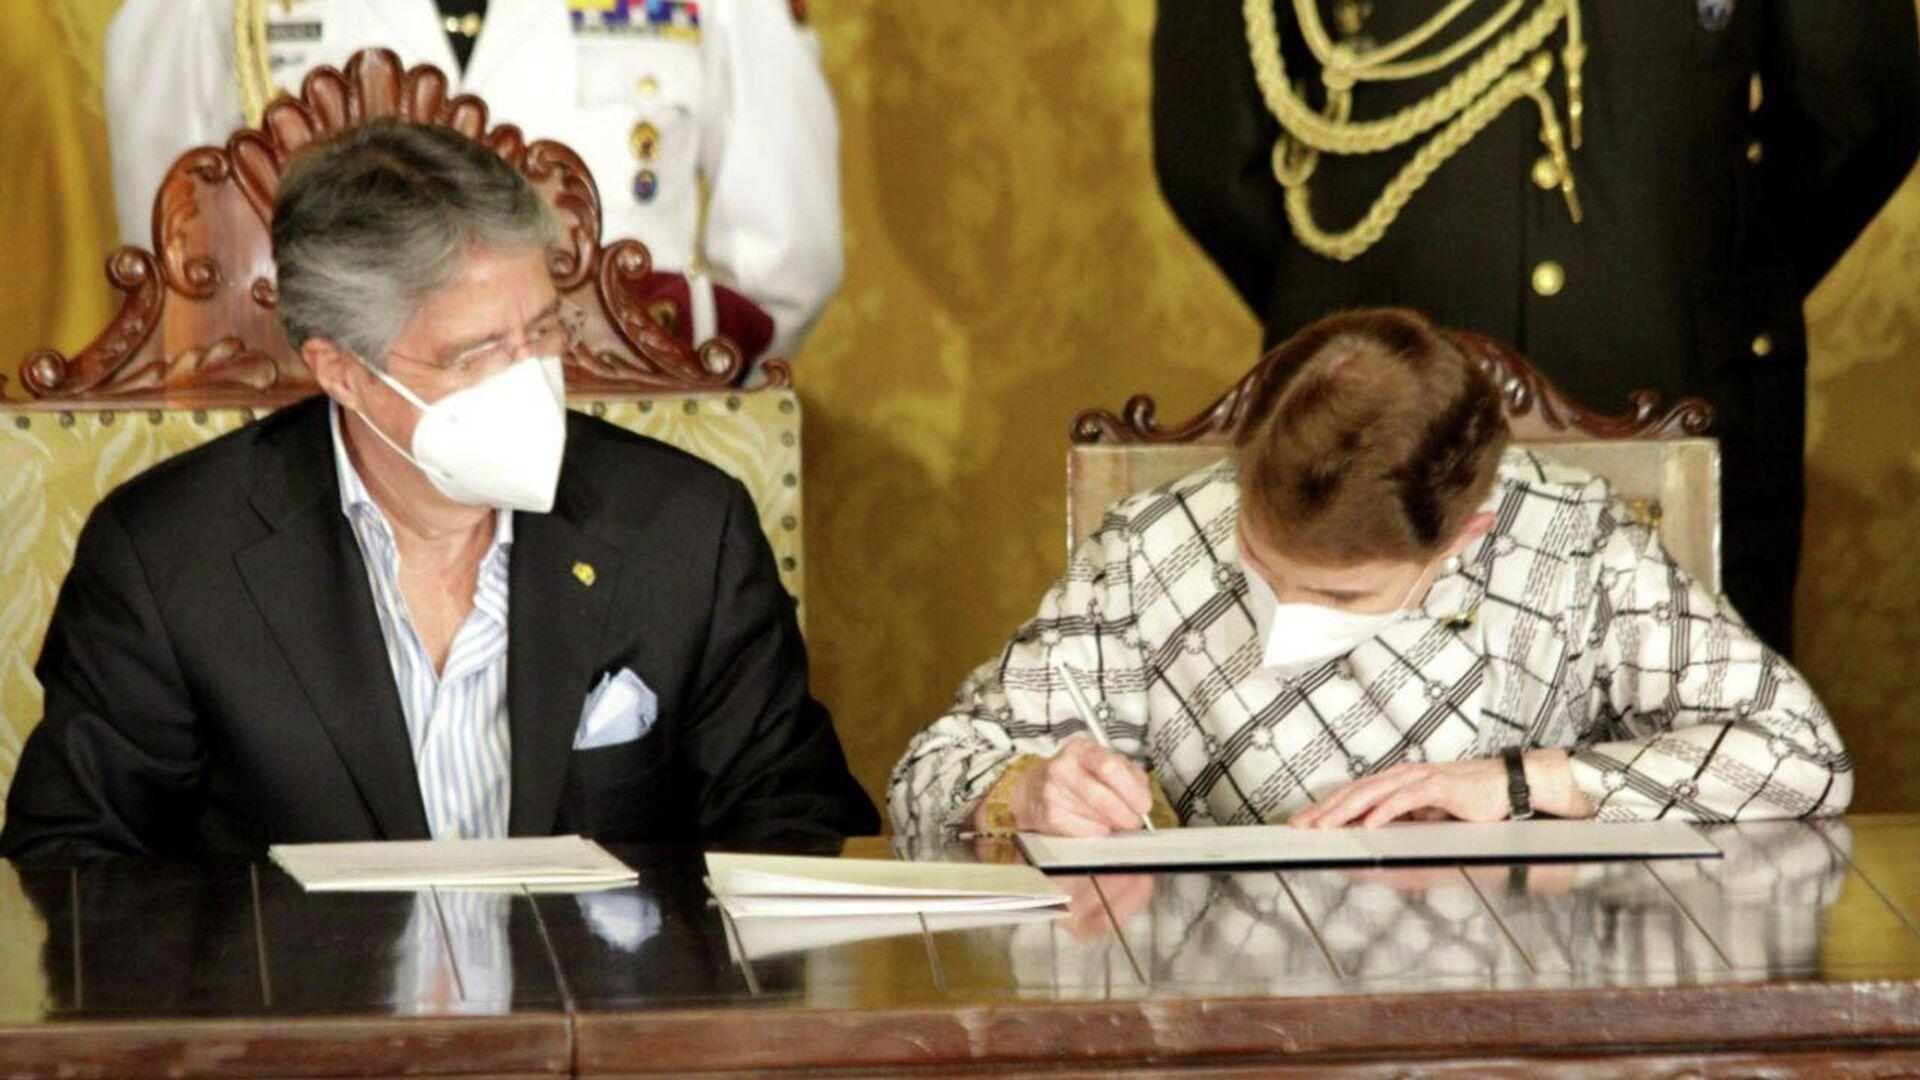 El presidente de Ecuador, Guillermo Lasso, posesionando a Alexandra Vela como nueva ministra de Gobierno de Ecuador - Sputnik Mundo, 1920, 15.07.2021